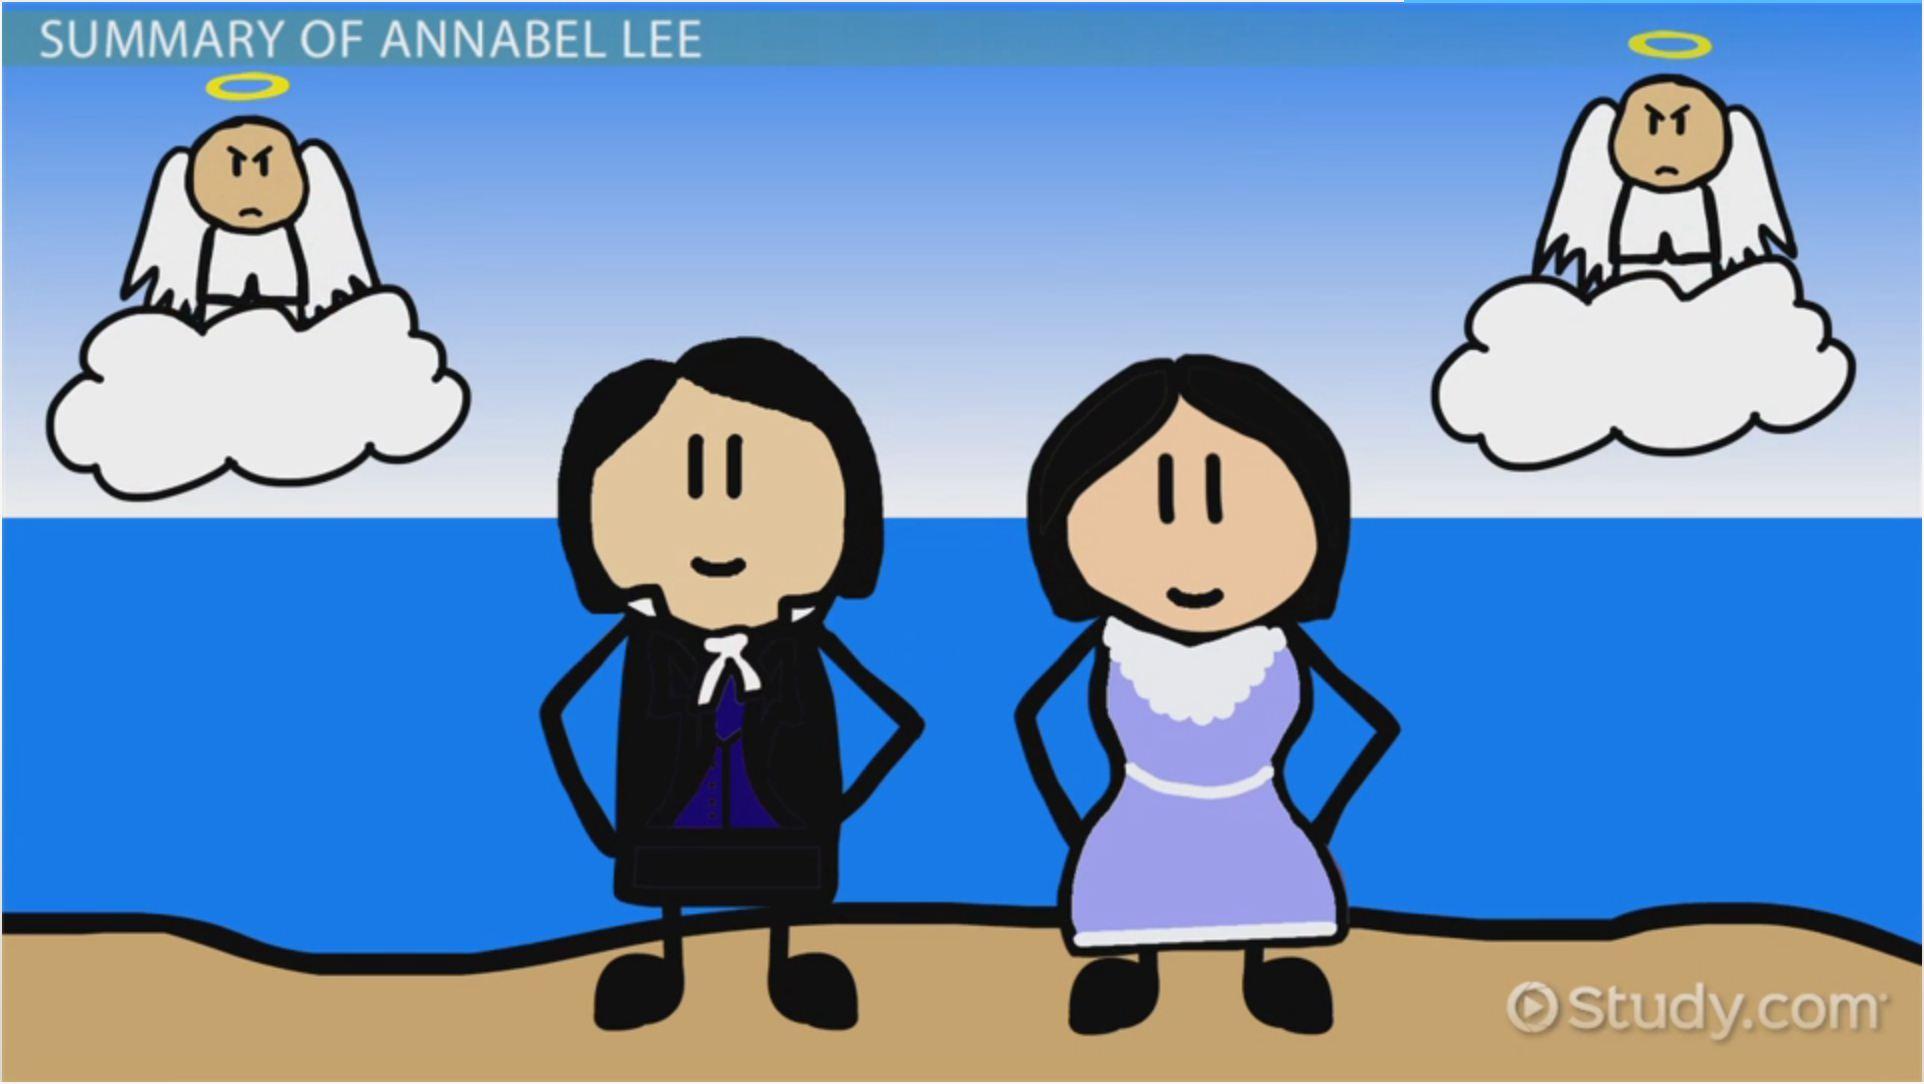 Annabel Lee By Edgar Allan Poe Summaryysis Amp Theme